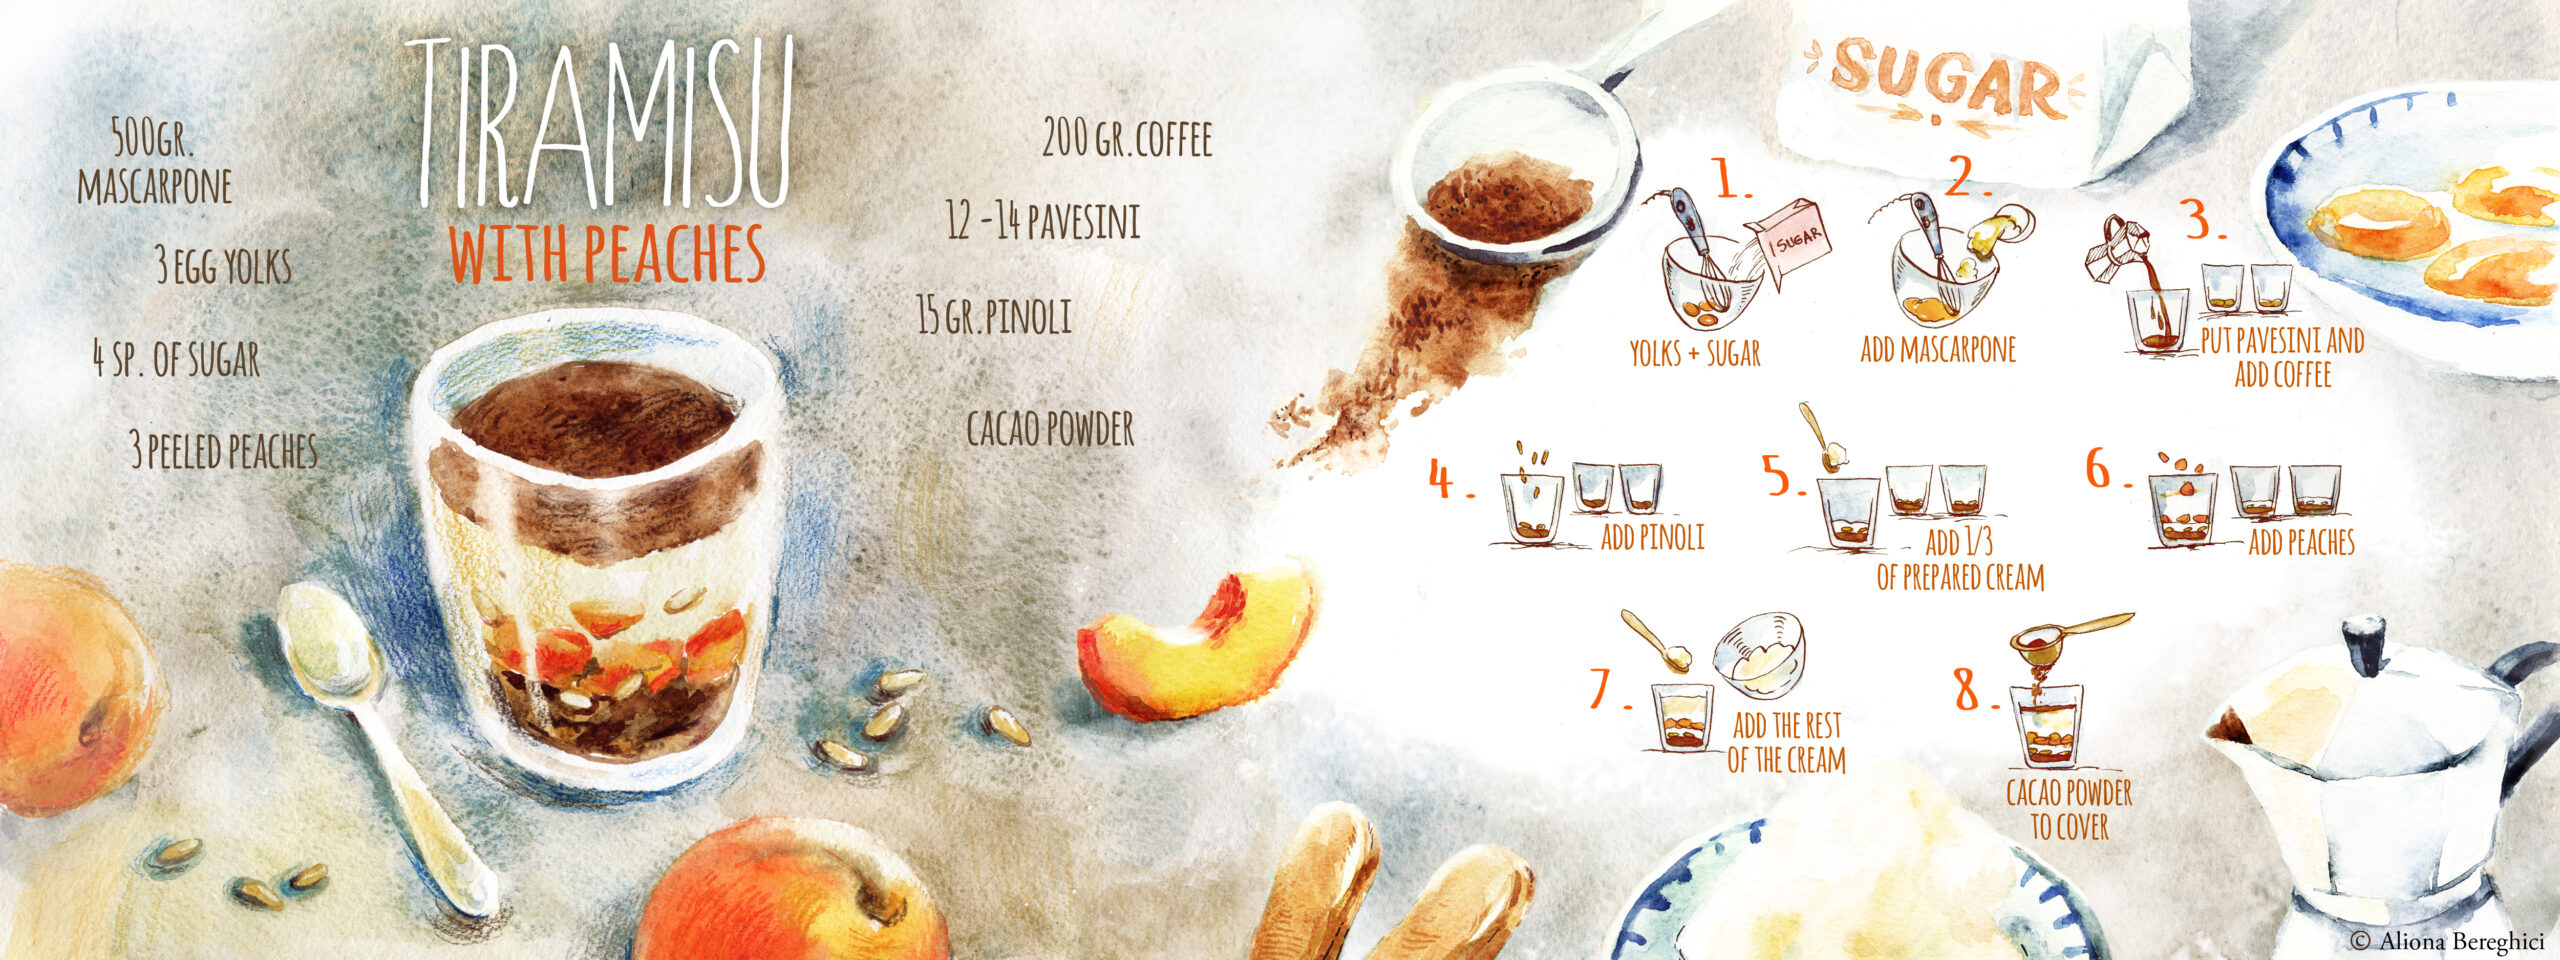 Peach Tiramisu